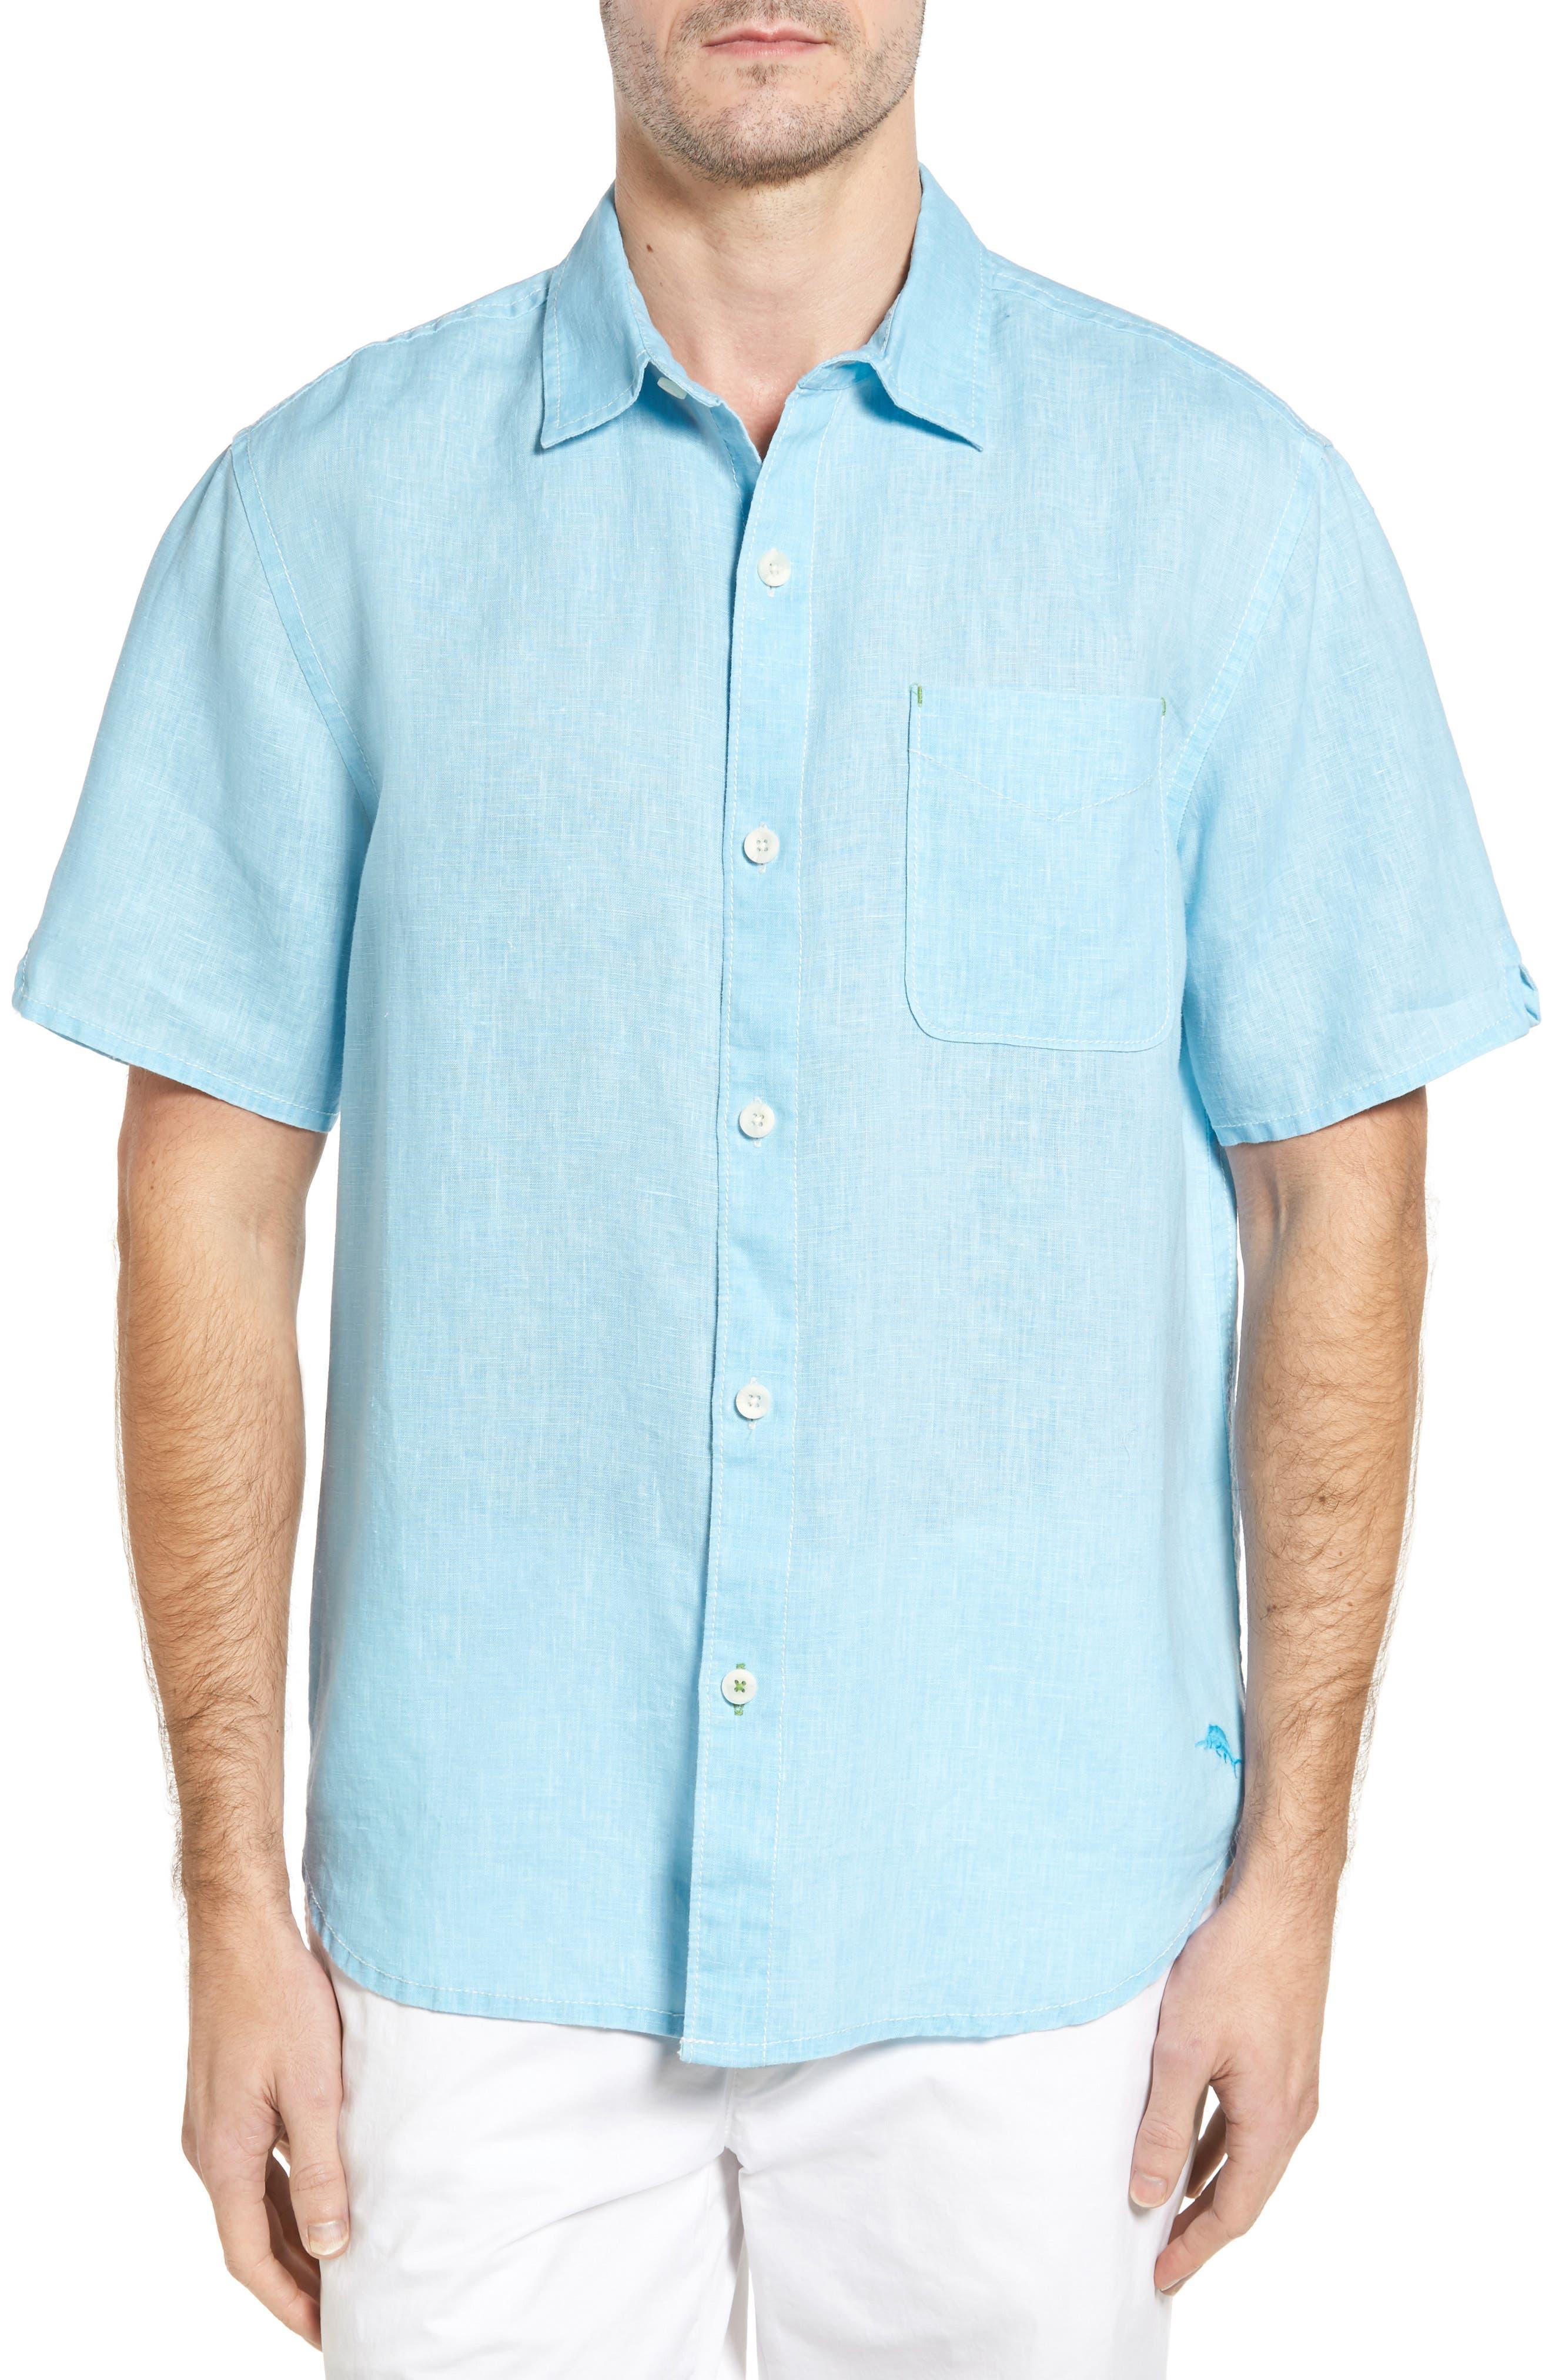 Alternate Image 1 Selected - Tommy Bahama Seaglass Breezer Short Sleeve Linen Sport Shirt